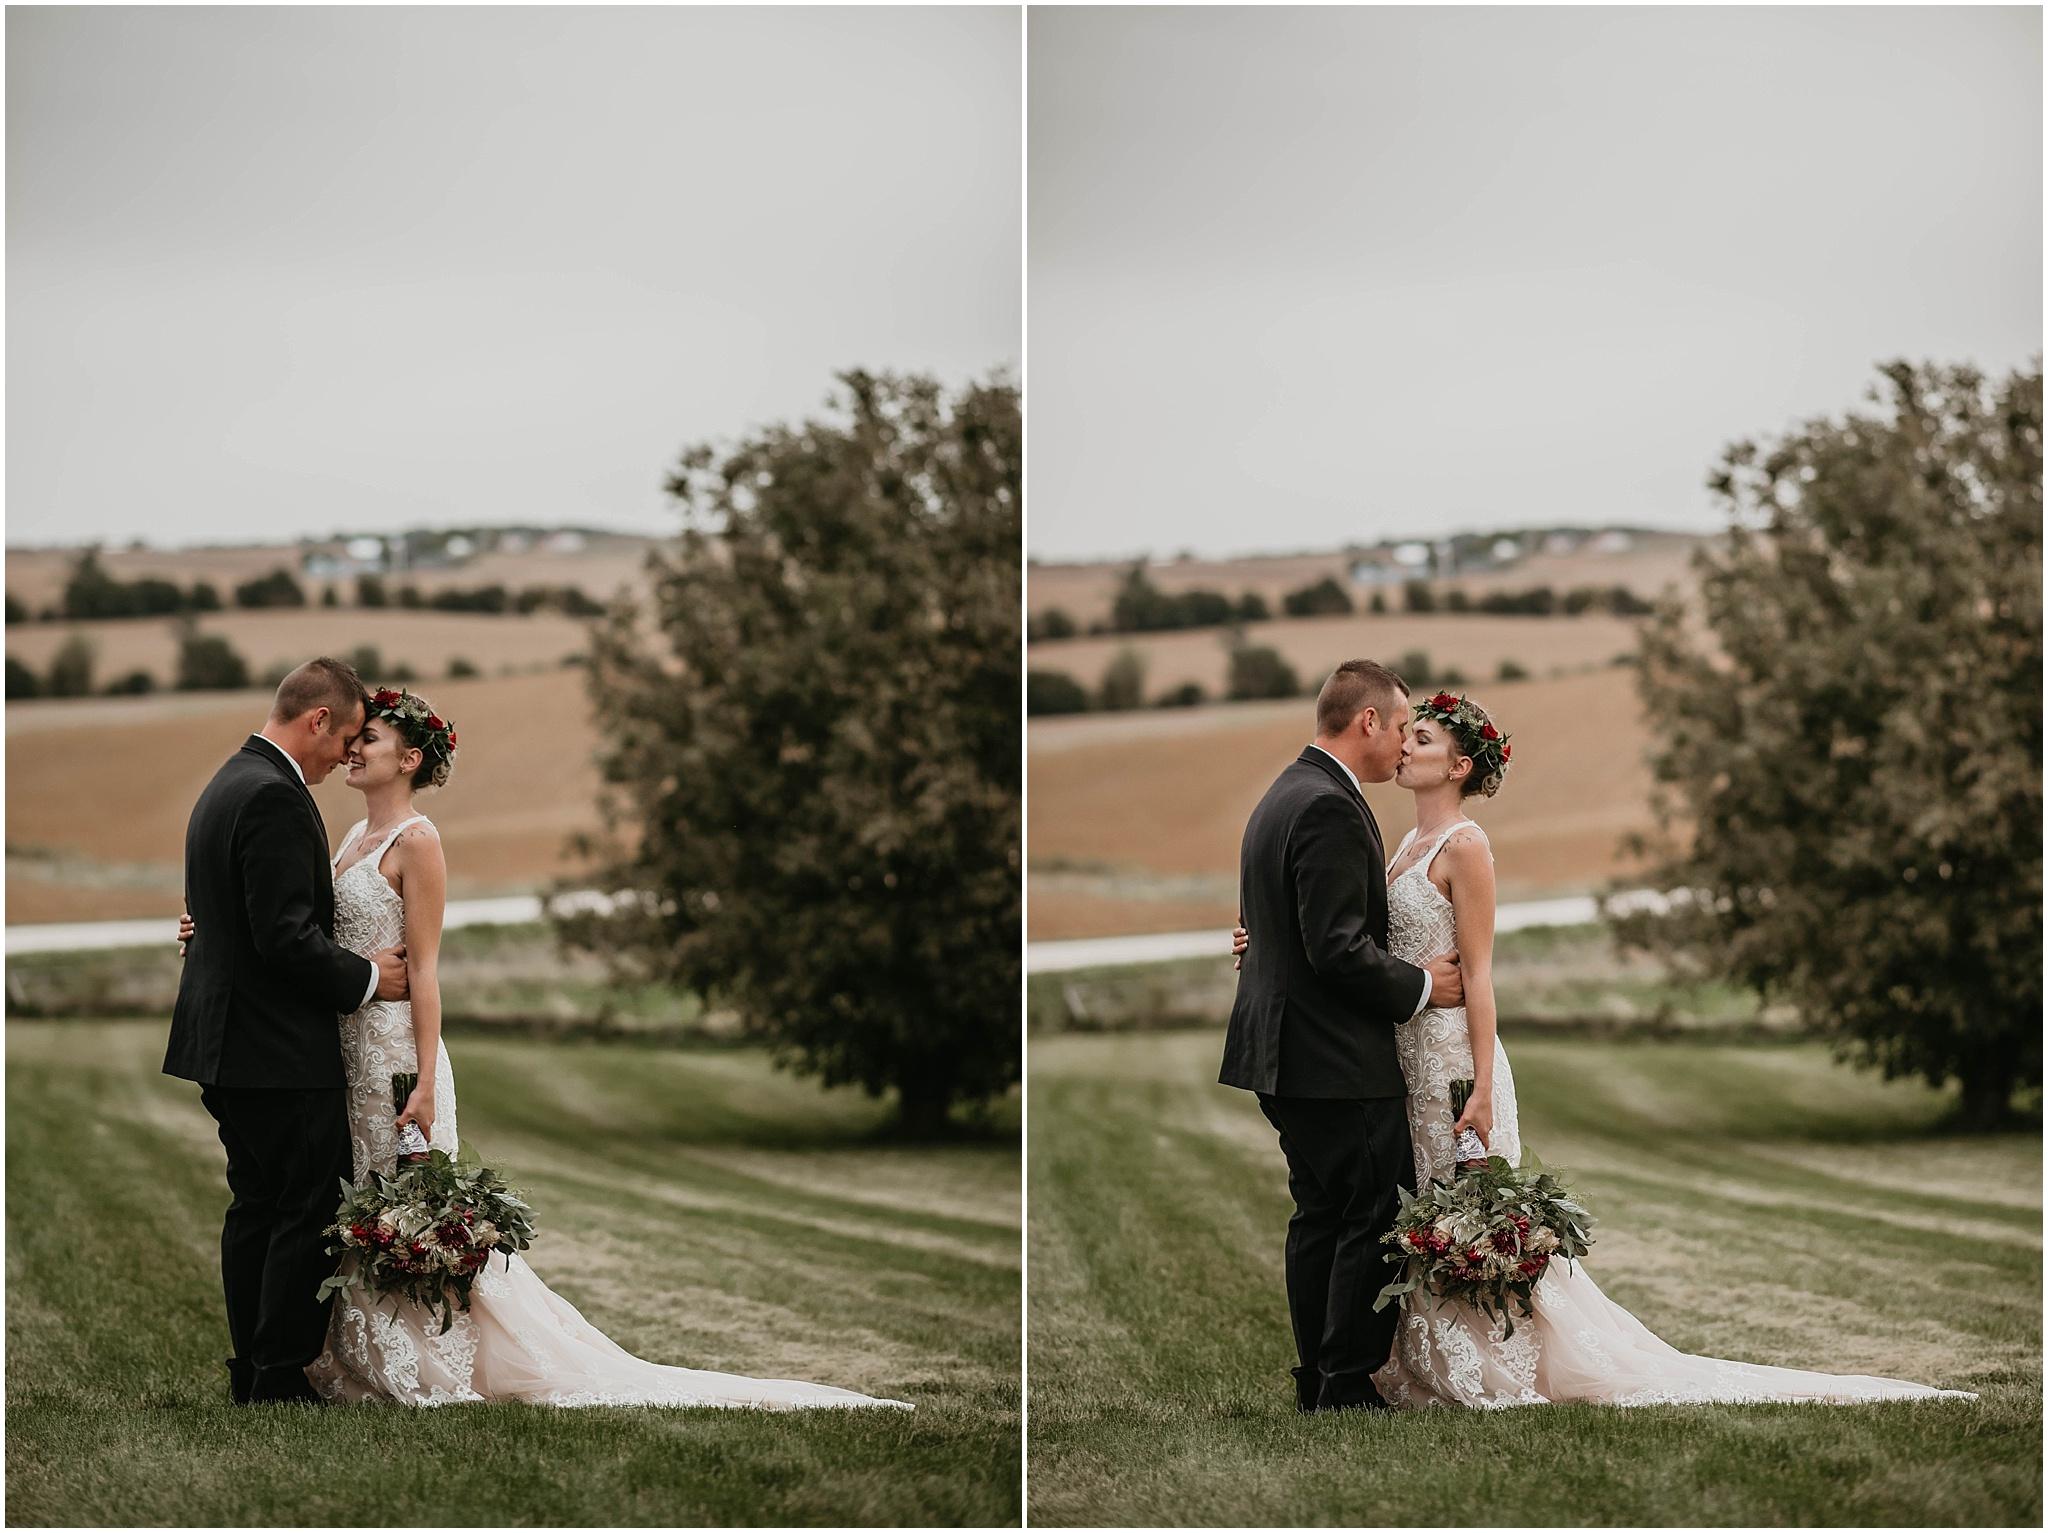 DesMoines-Iowa-Wedding-Photography-Destination-Photographer_0162.jpg